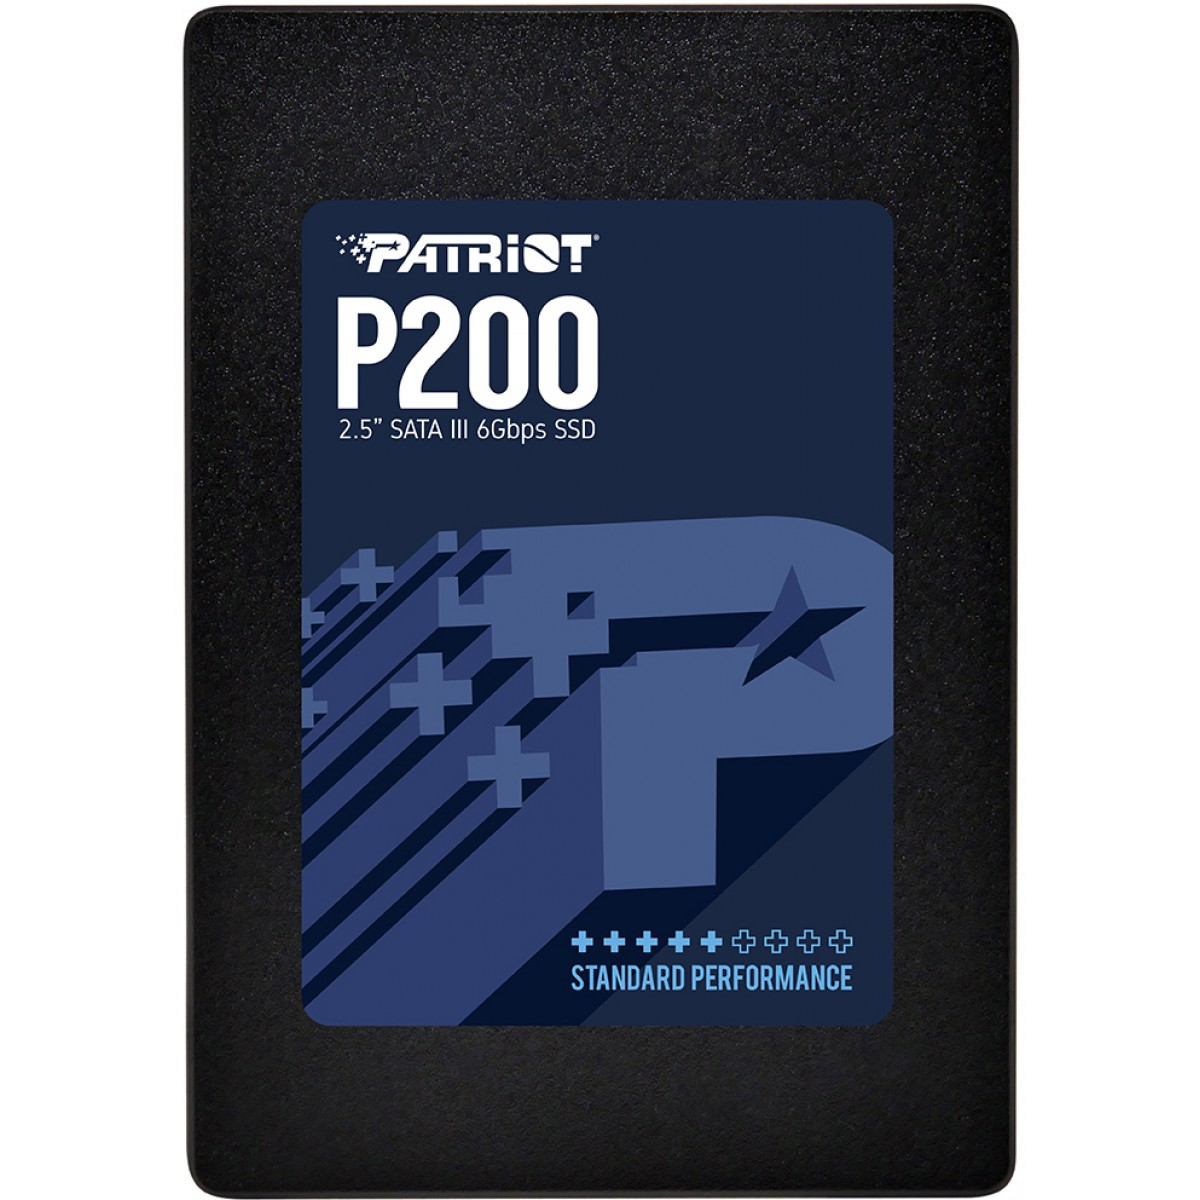 SSD Patriot P200, 128GB, Sata III, Leitura 500MBs e Gravação 430MBs, P200S128G25C